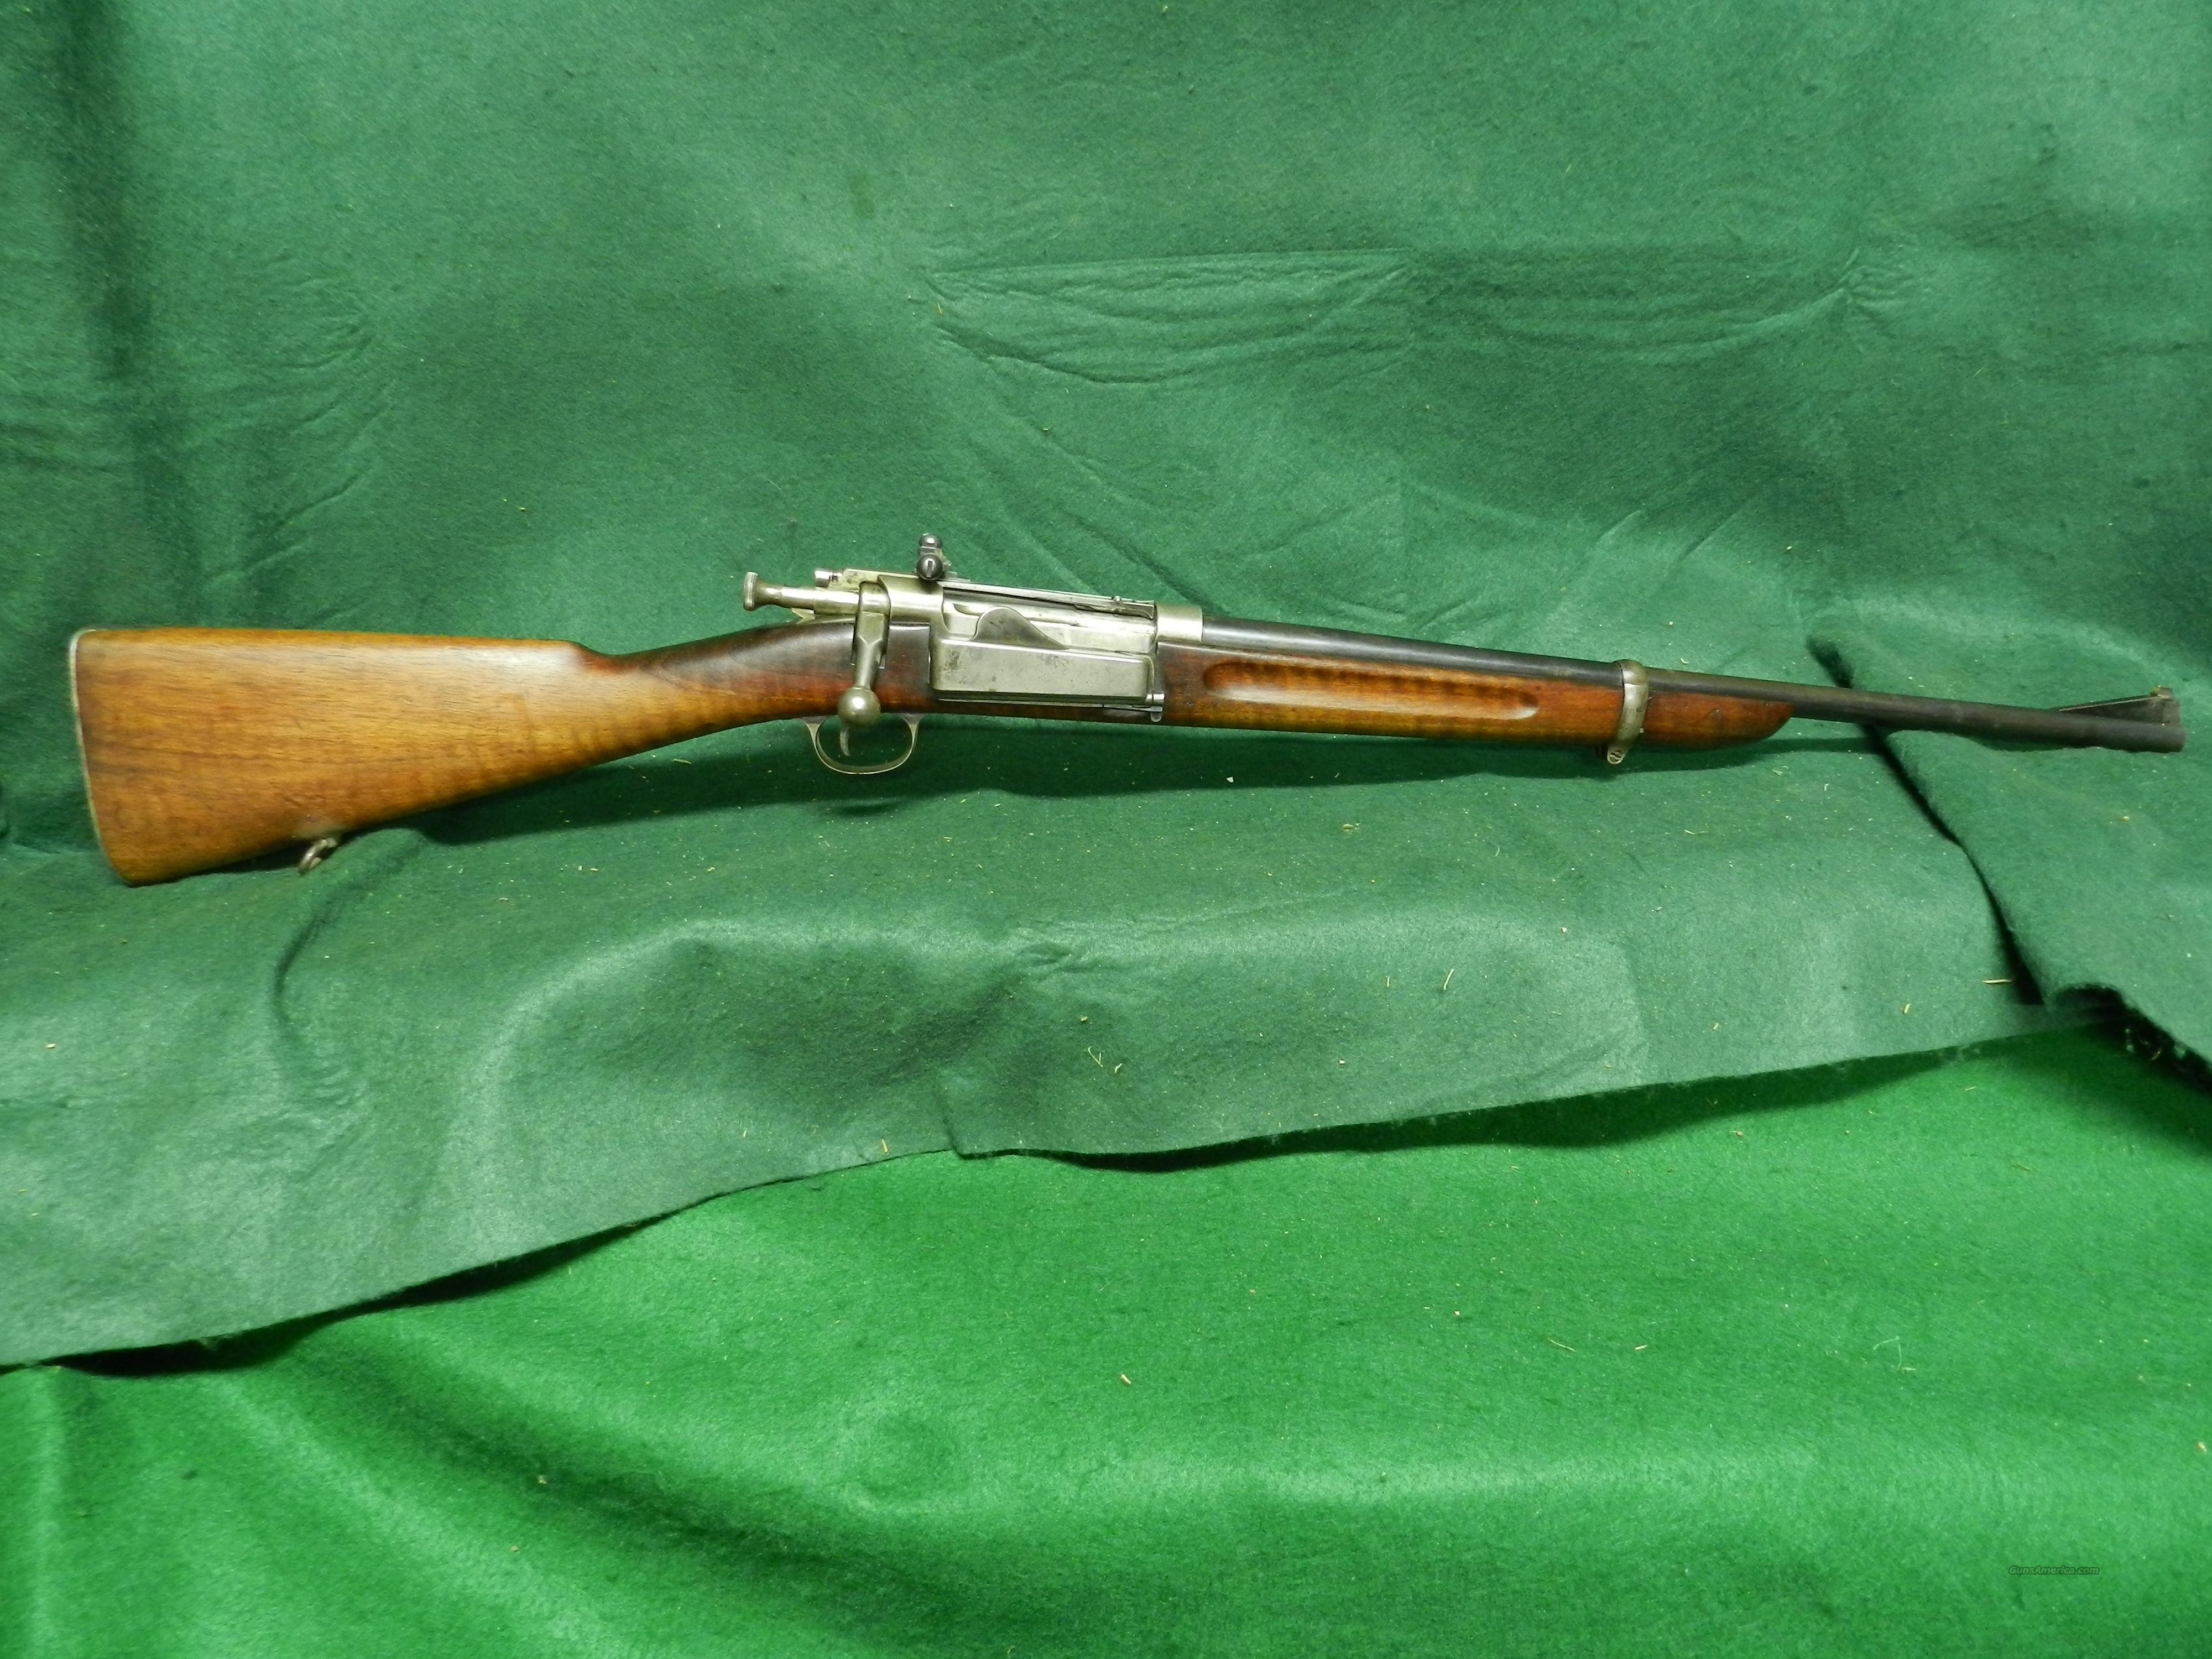 US Krag jorgensen model 1898 rifle complete 30-40 cal barrel with front sight mt